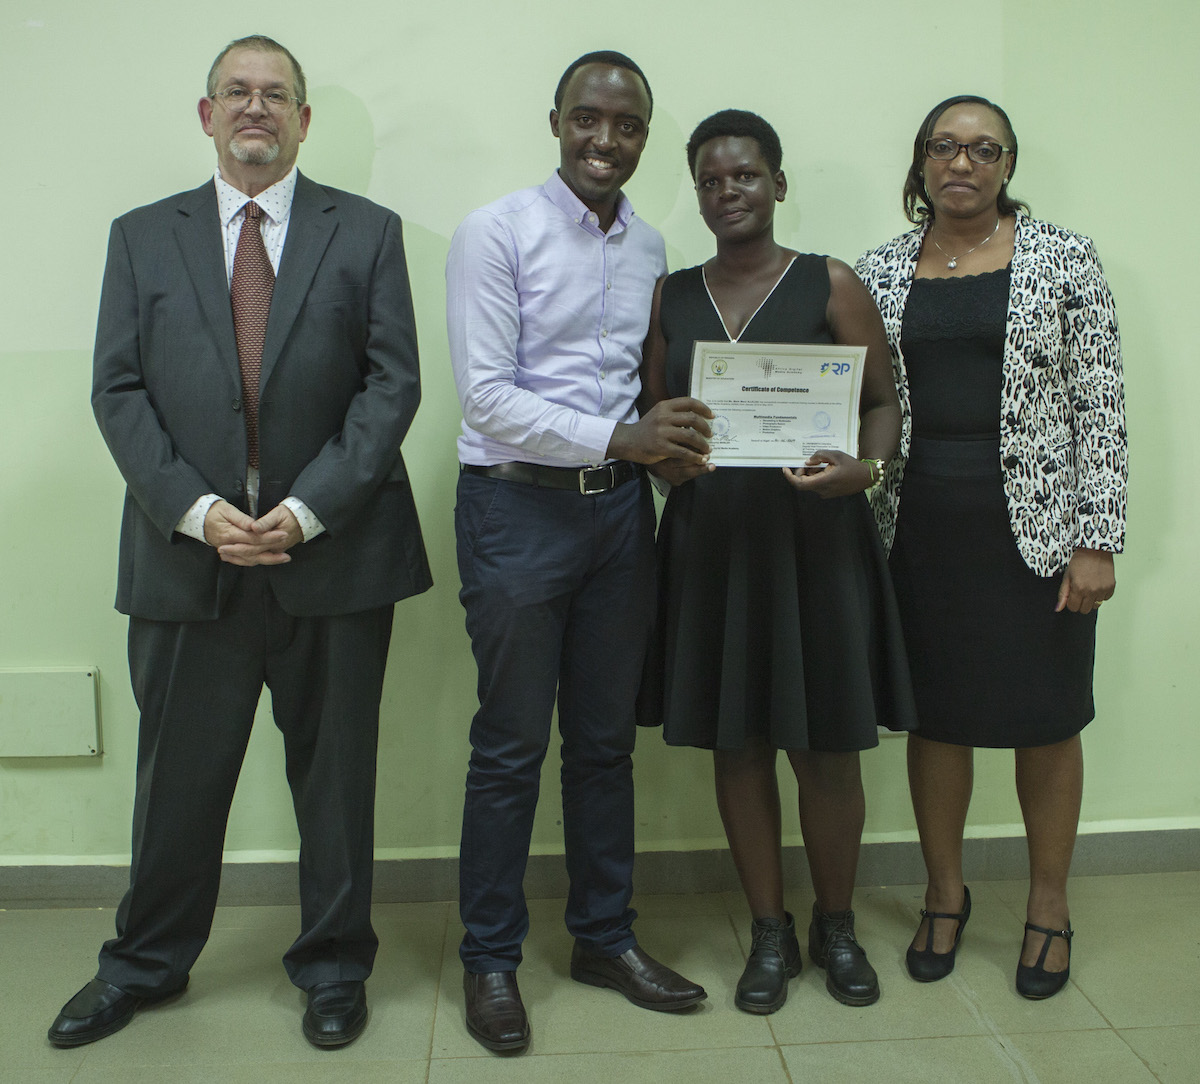 ADMA Graduate Marie Merci Alleluia